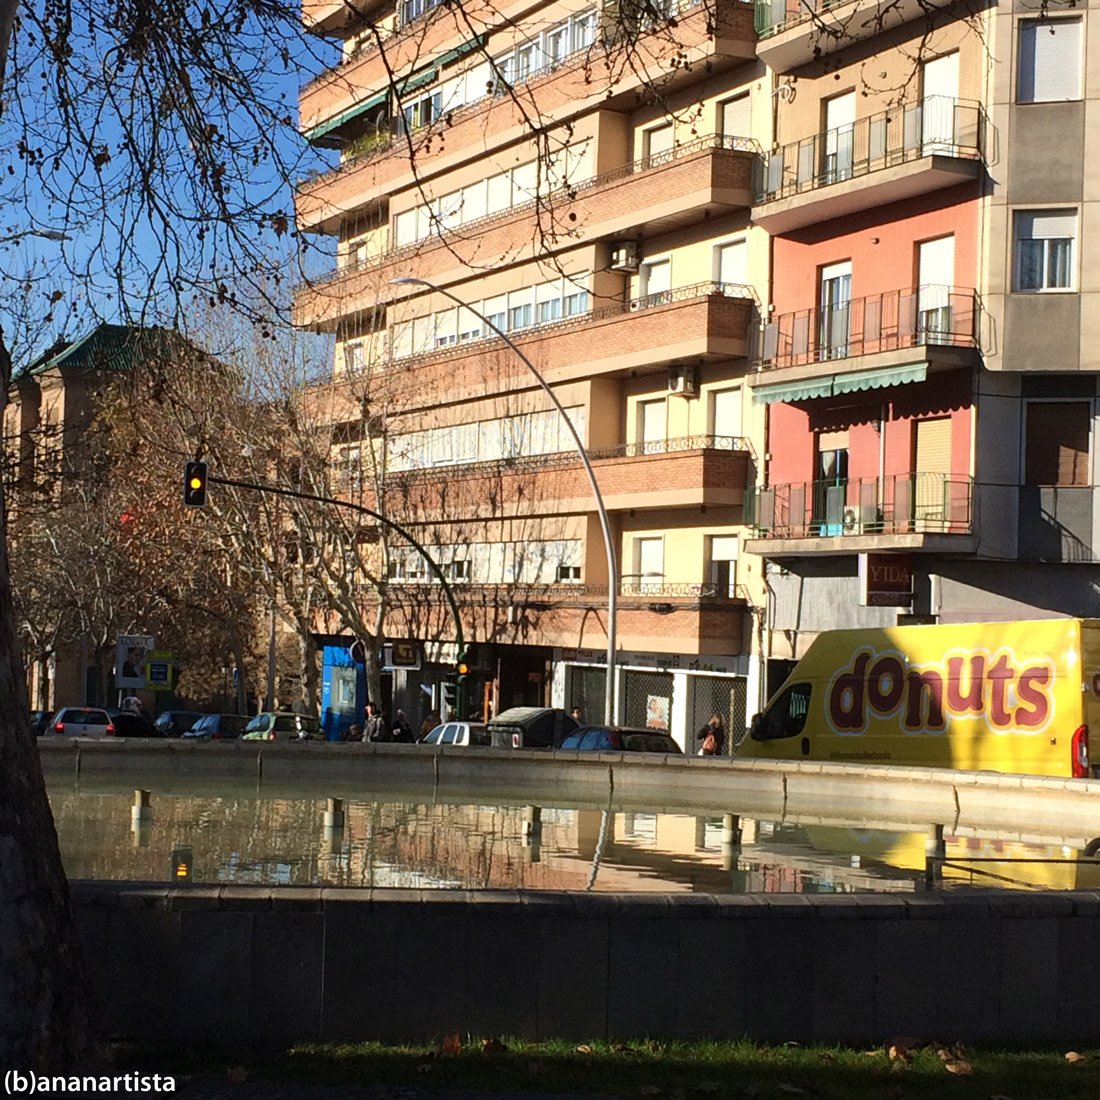 donuts: fotografia di (b)ananartista sbuff